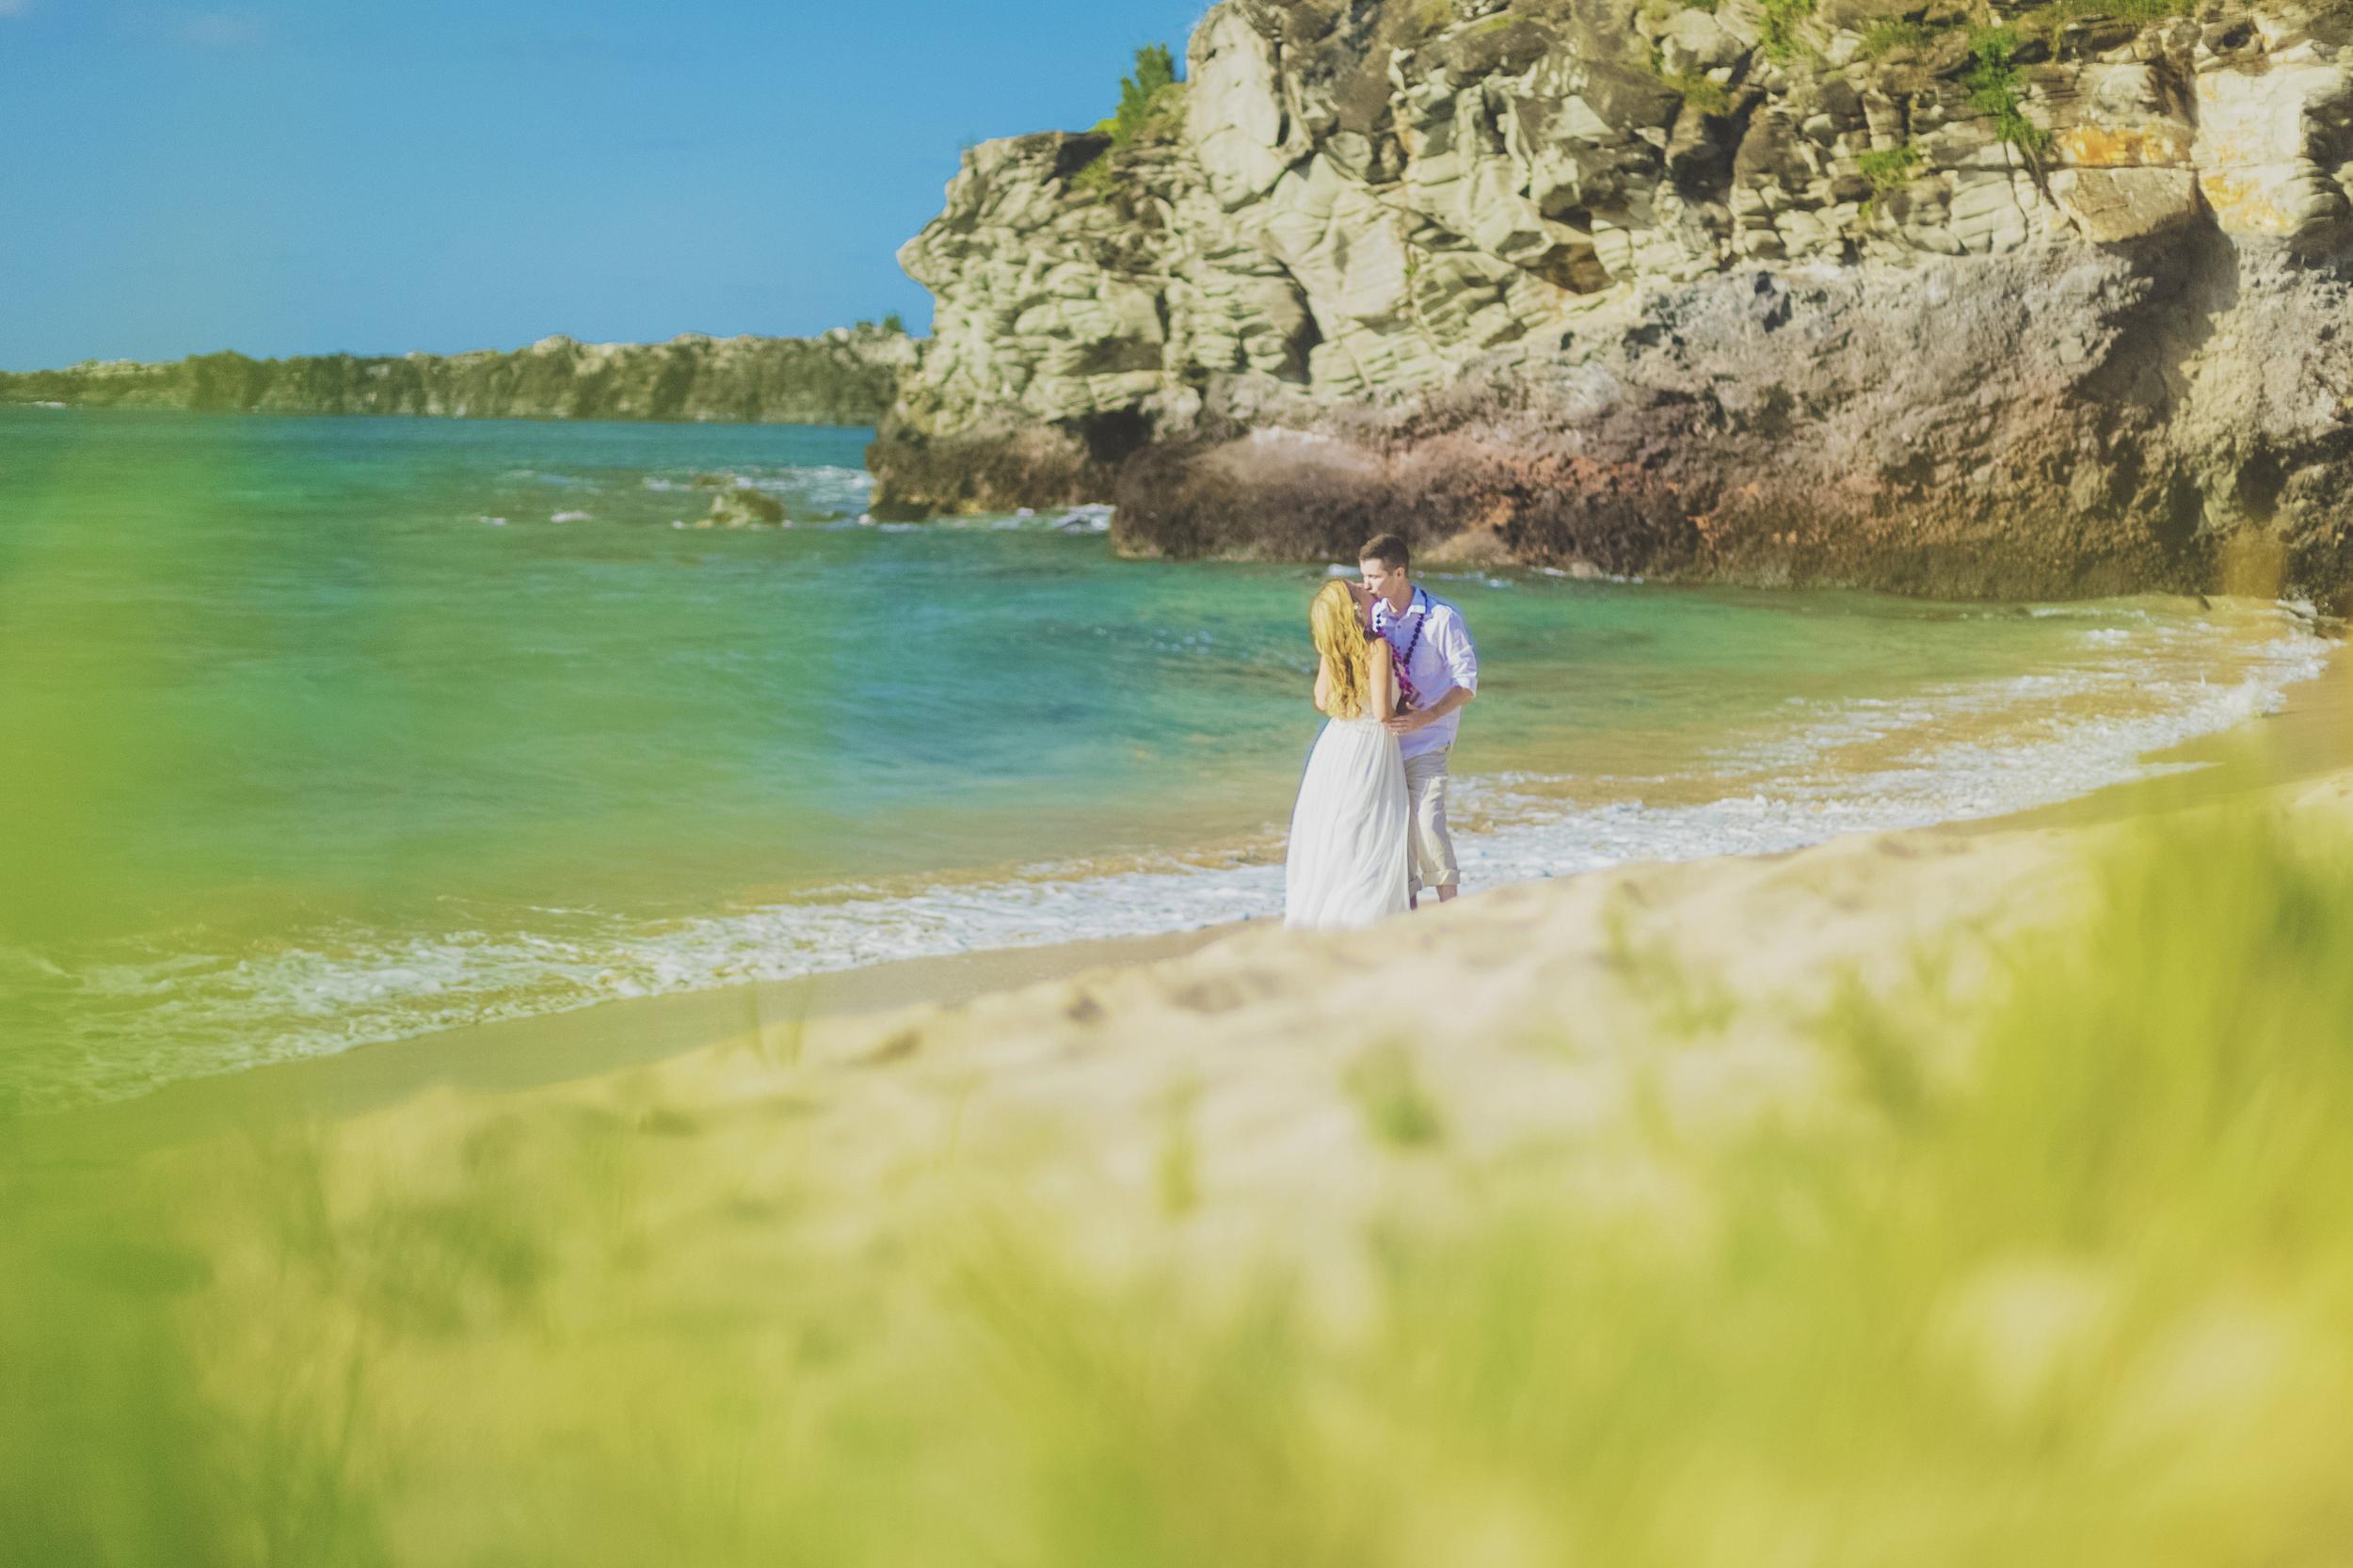 angie-diaz-photography-maui-honeymoon-hawaii-elopement-9.jpg